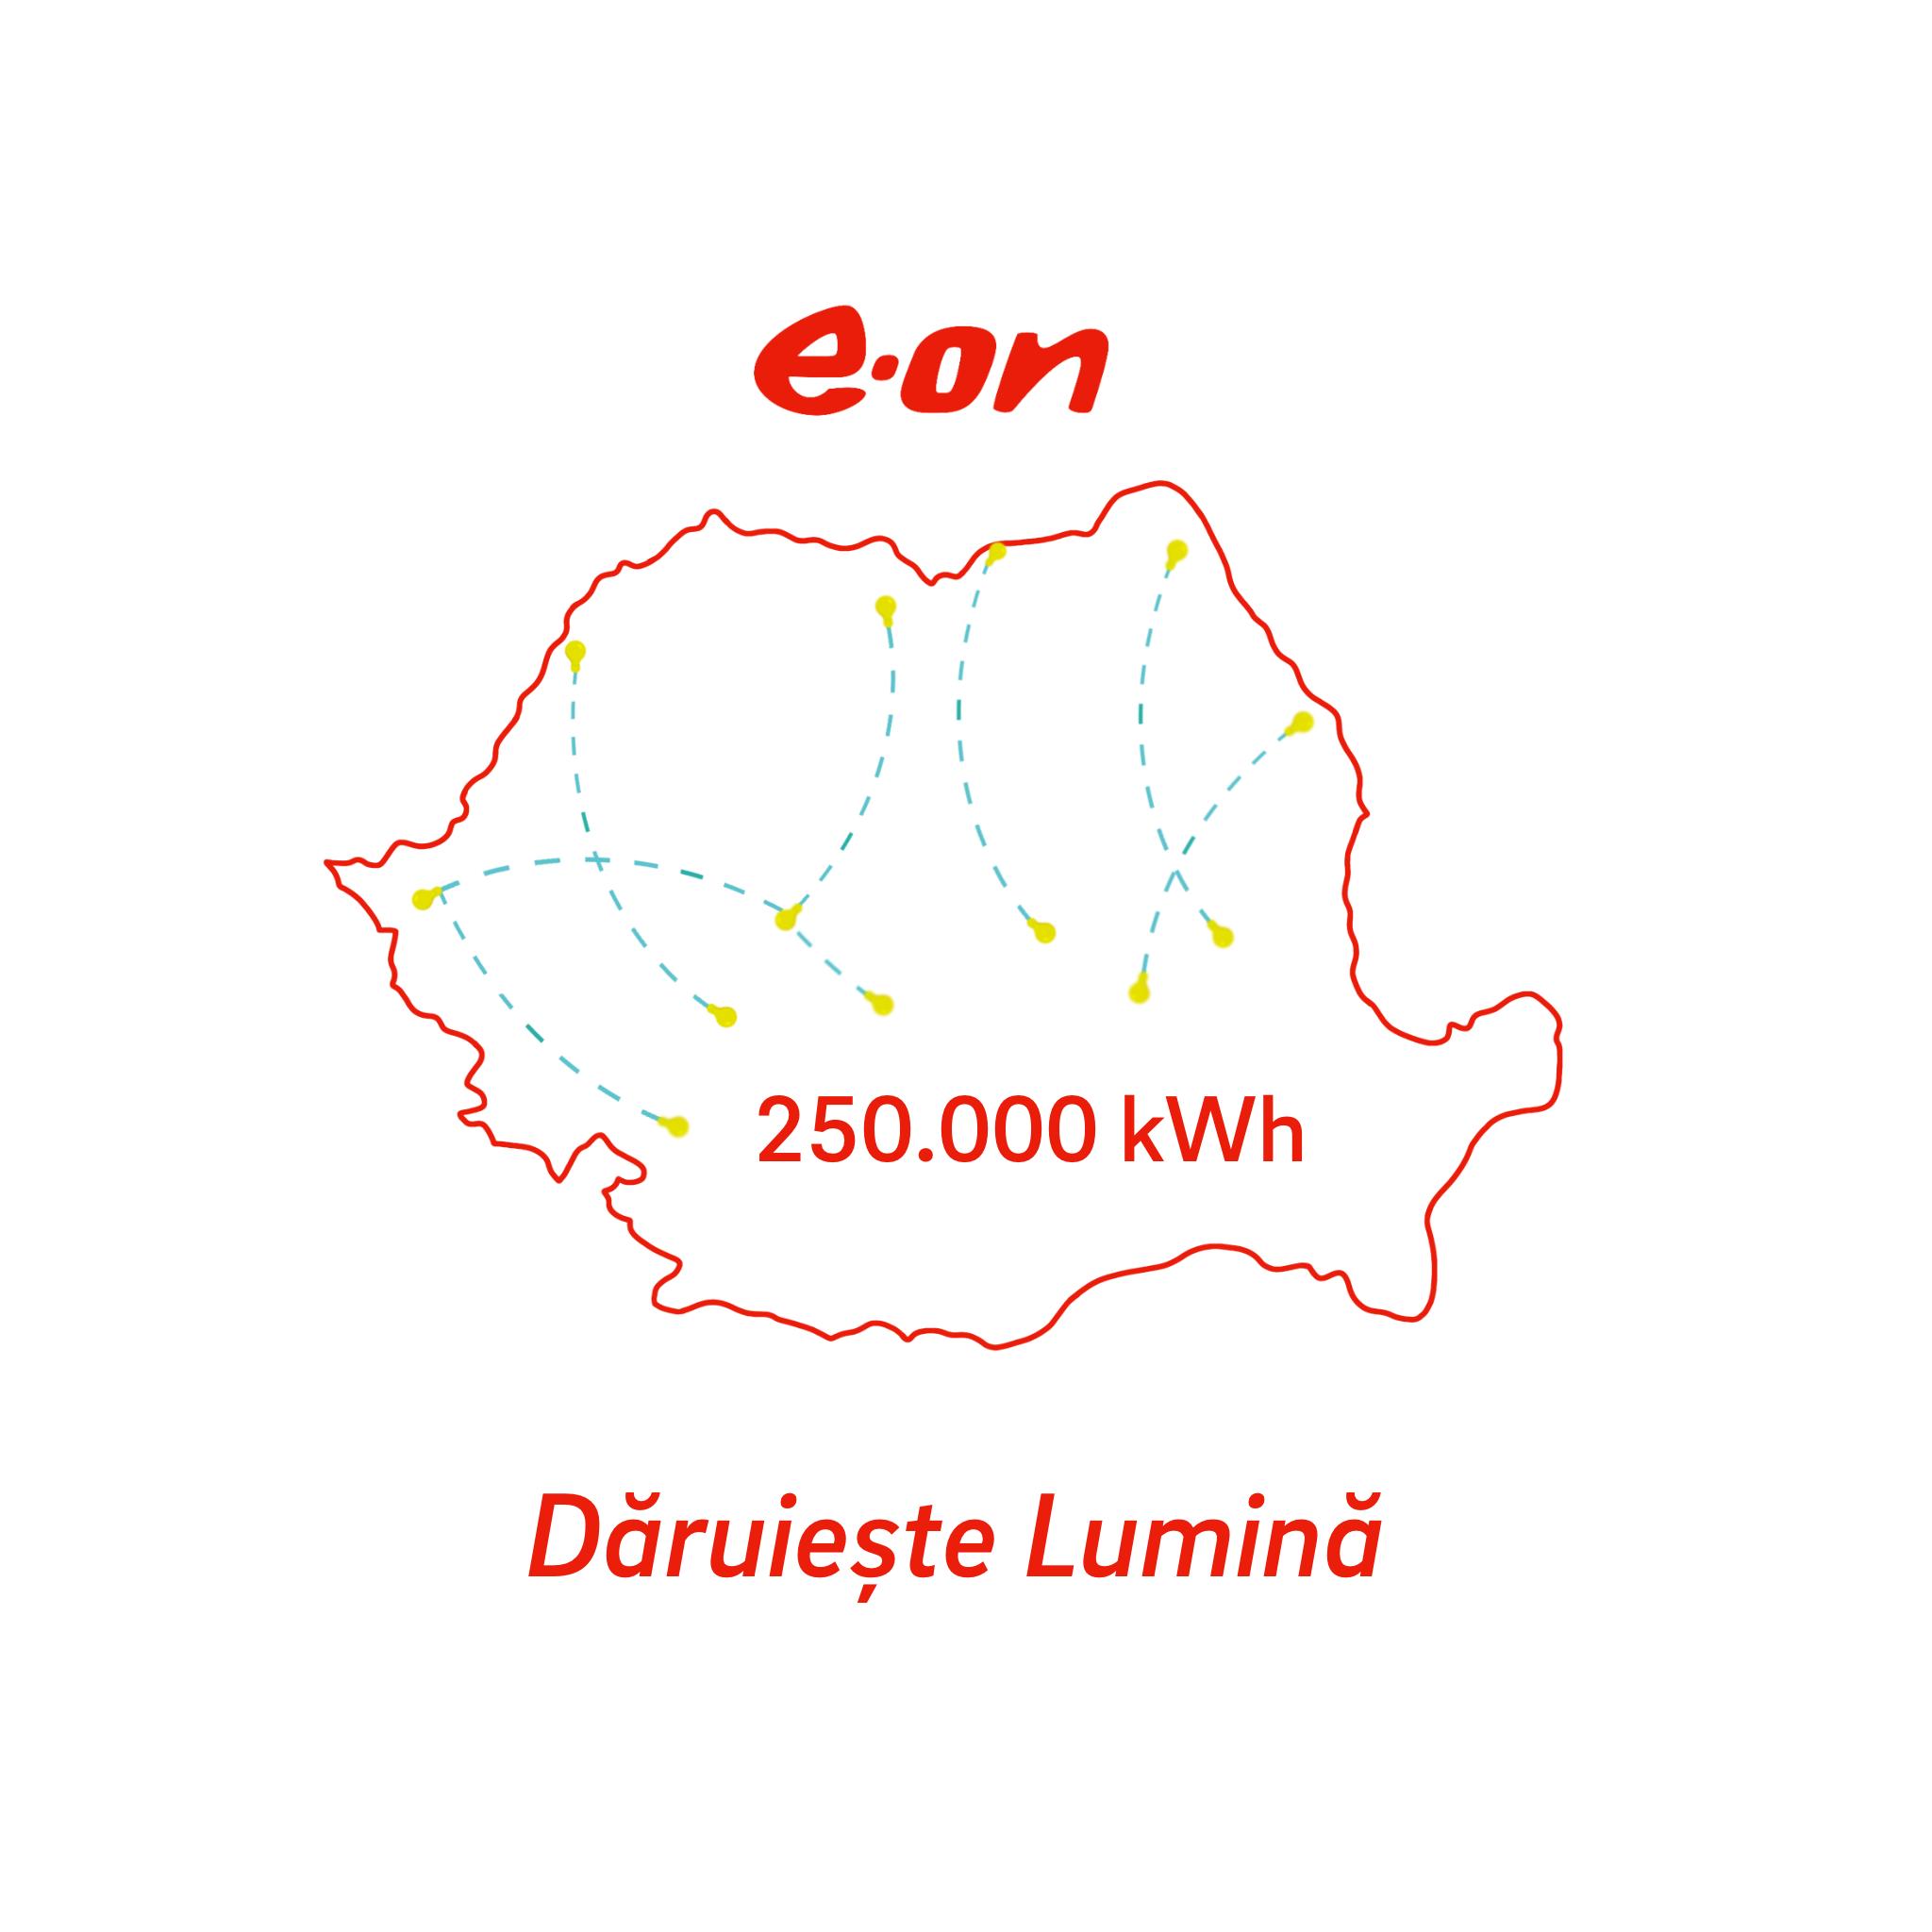 E.ON Daruieste Lumina